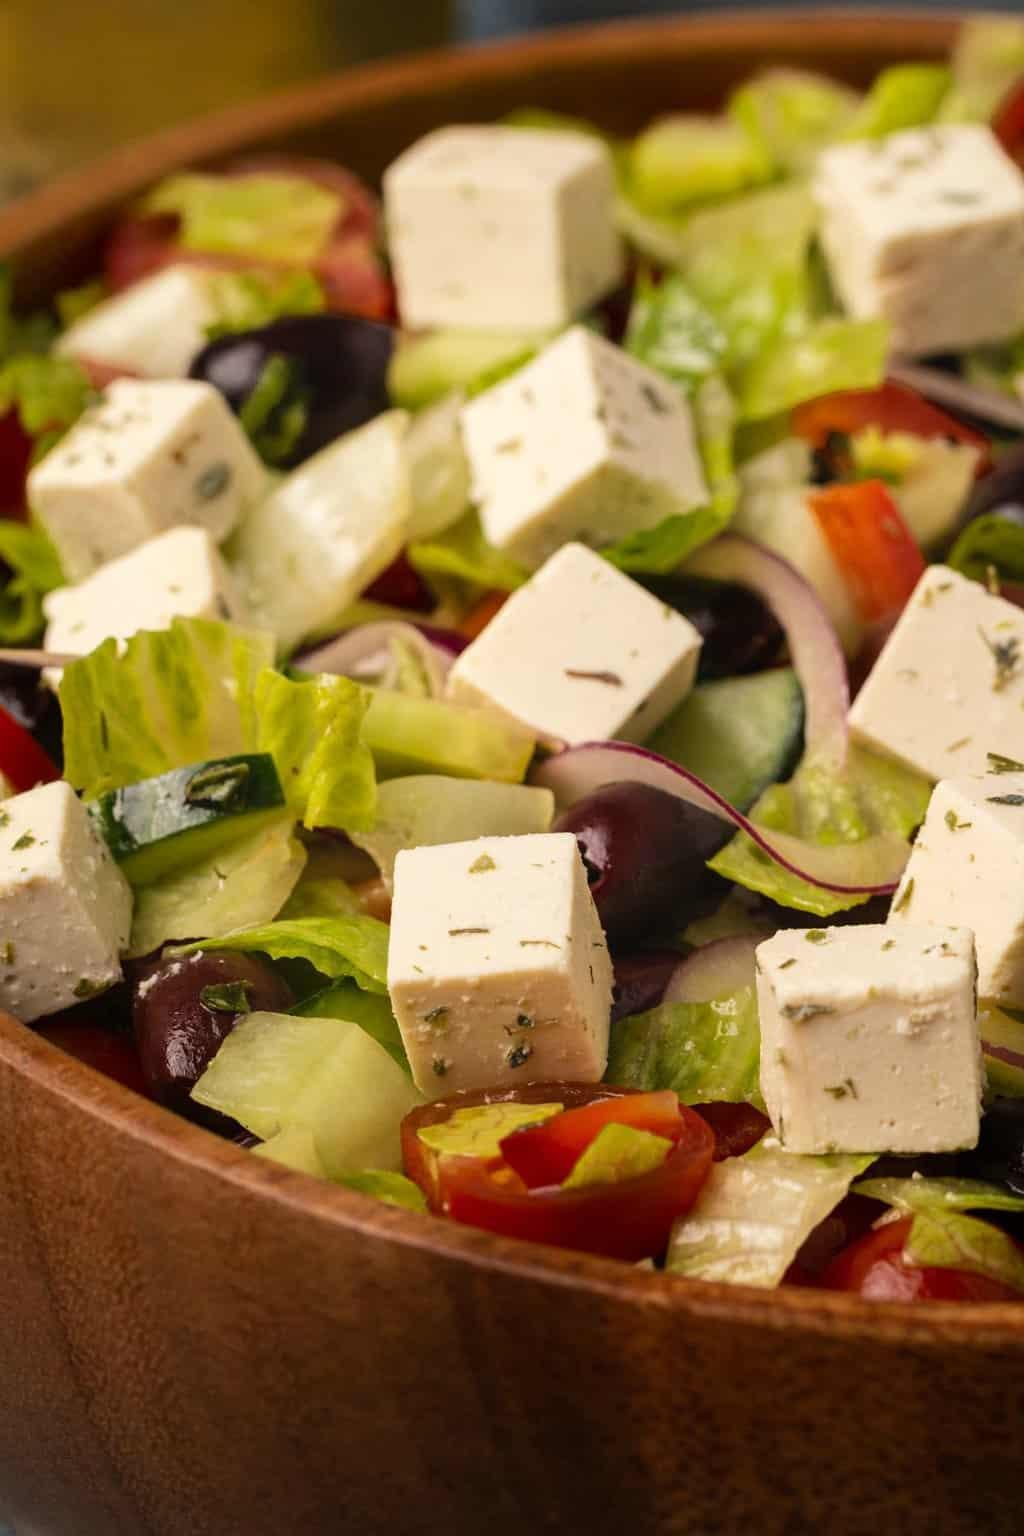 Vegan Greek Salad in a wooden salad bowl.